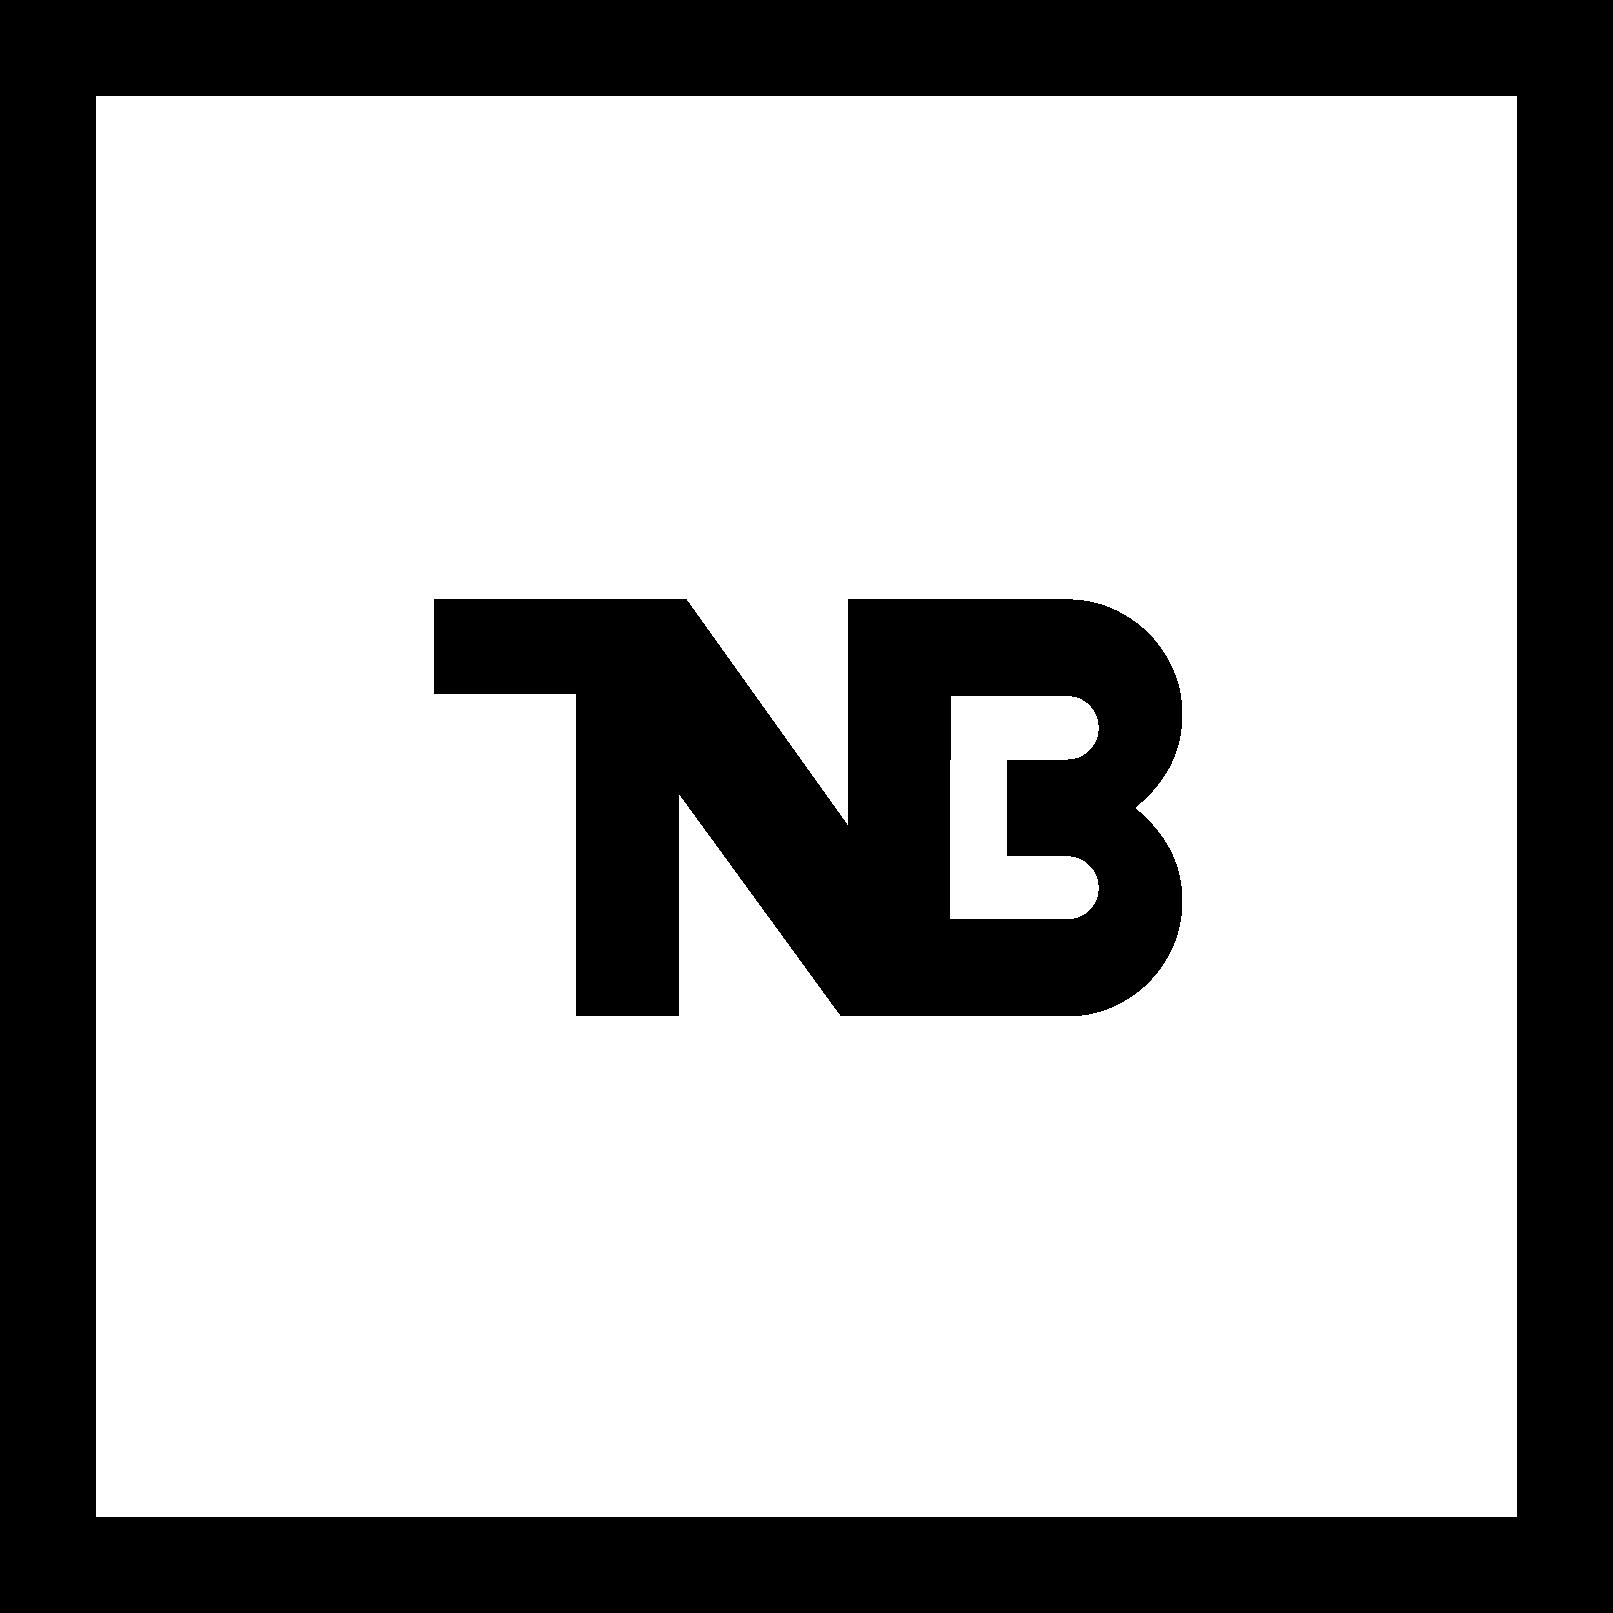 TNB_SquareMark_Black.png